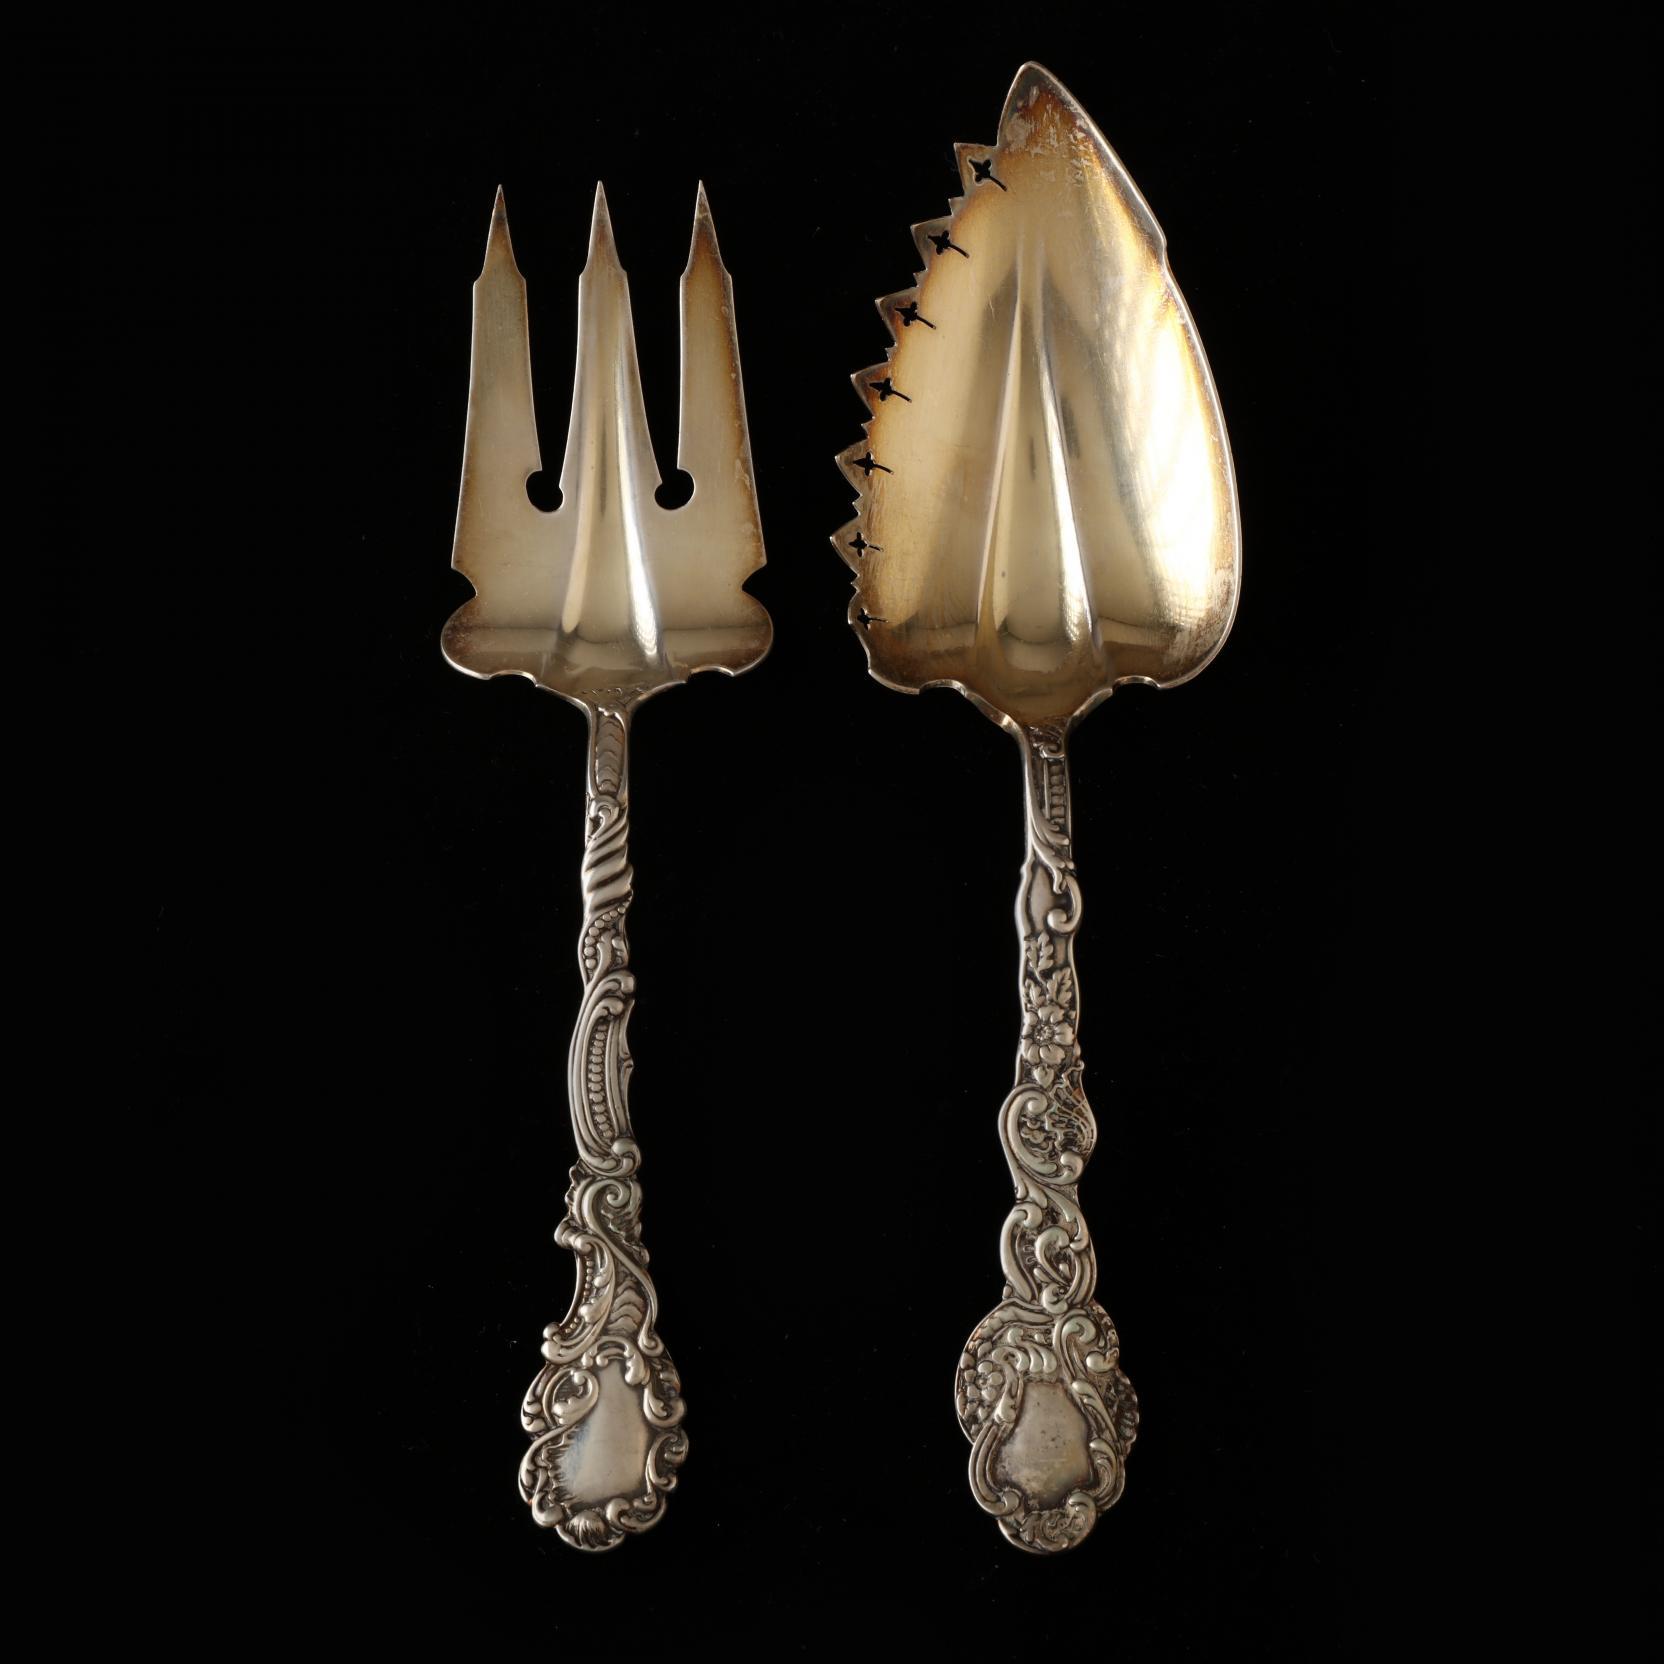 two-gorham-marie-antoinette-sterling-silver-servers